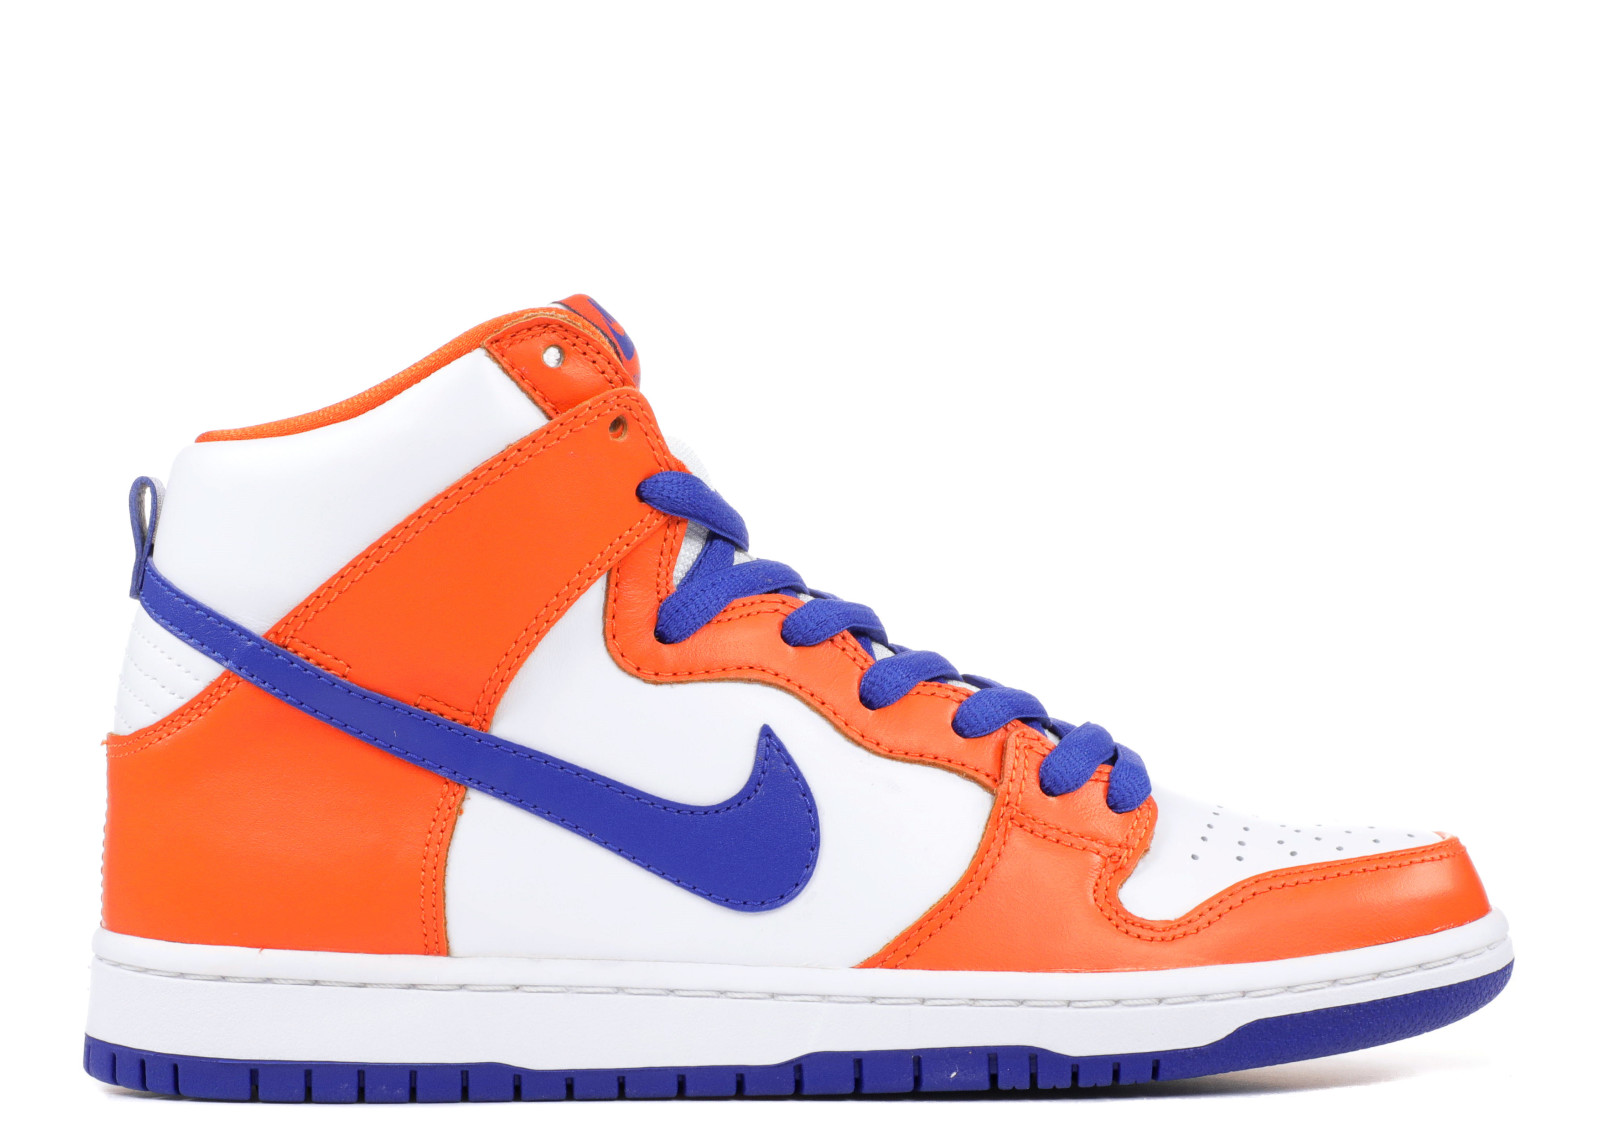 new products 180ae 4575f Nike - Men - Nike Sb Dunk High Trd Qs  Danny Supa  - Ah0471-841 - Size 11